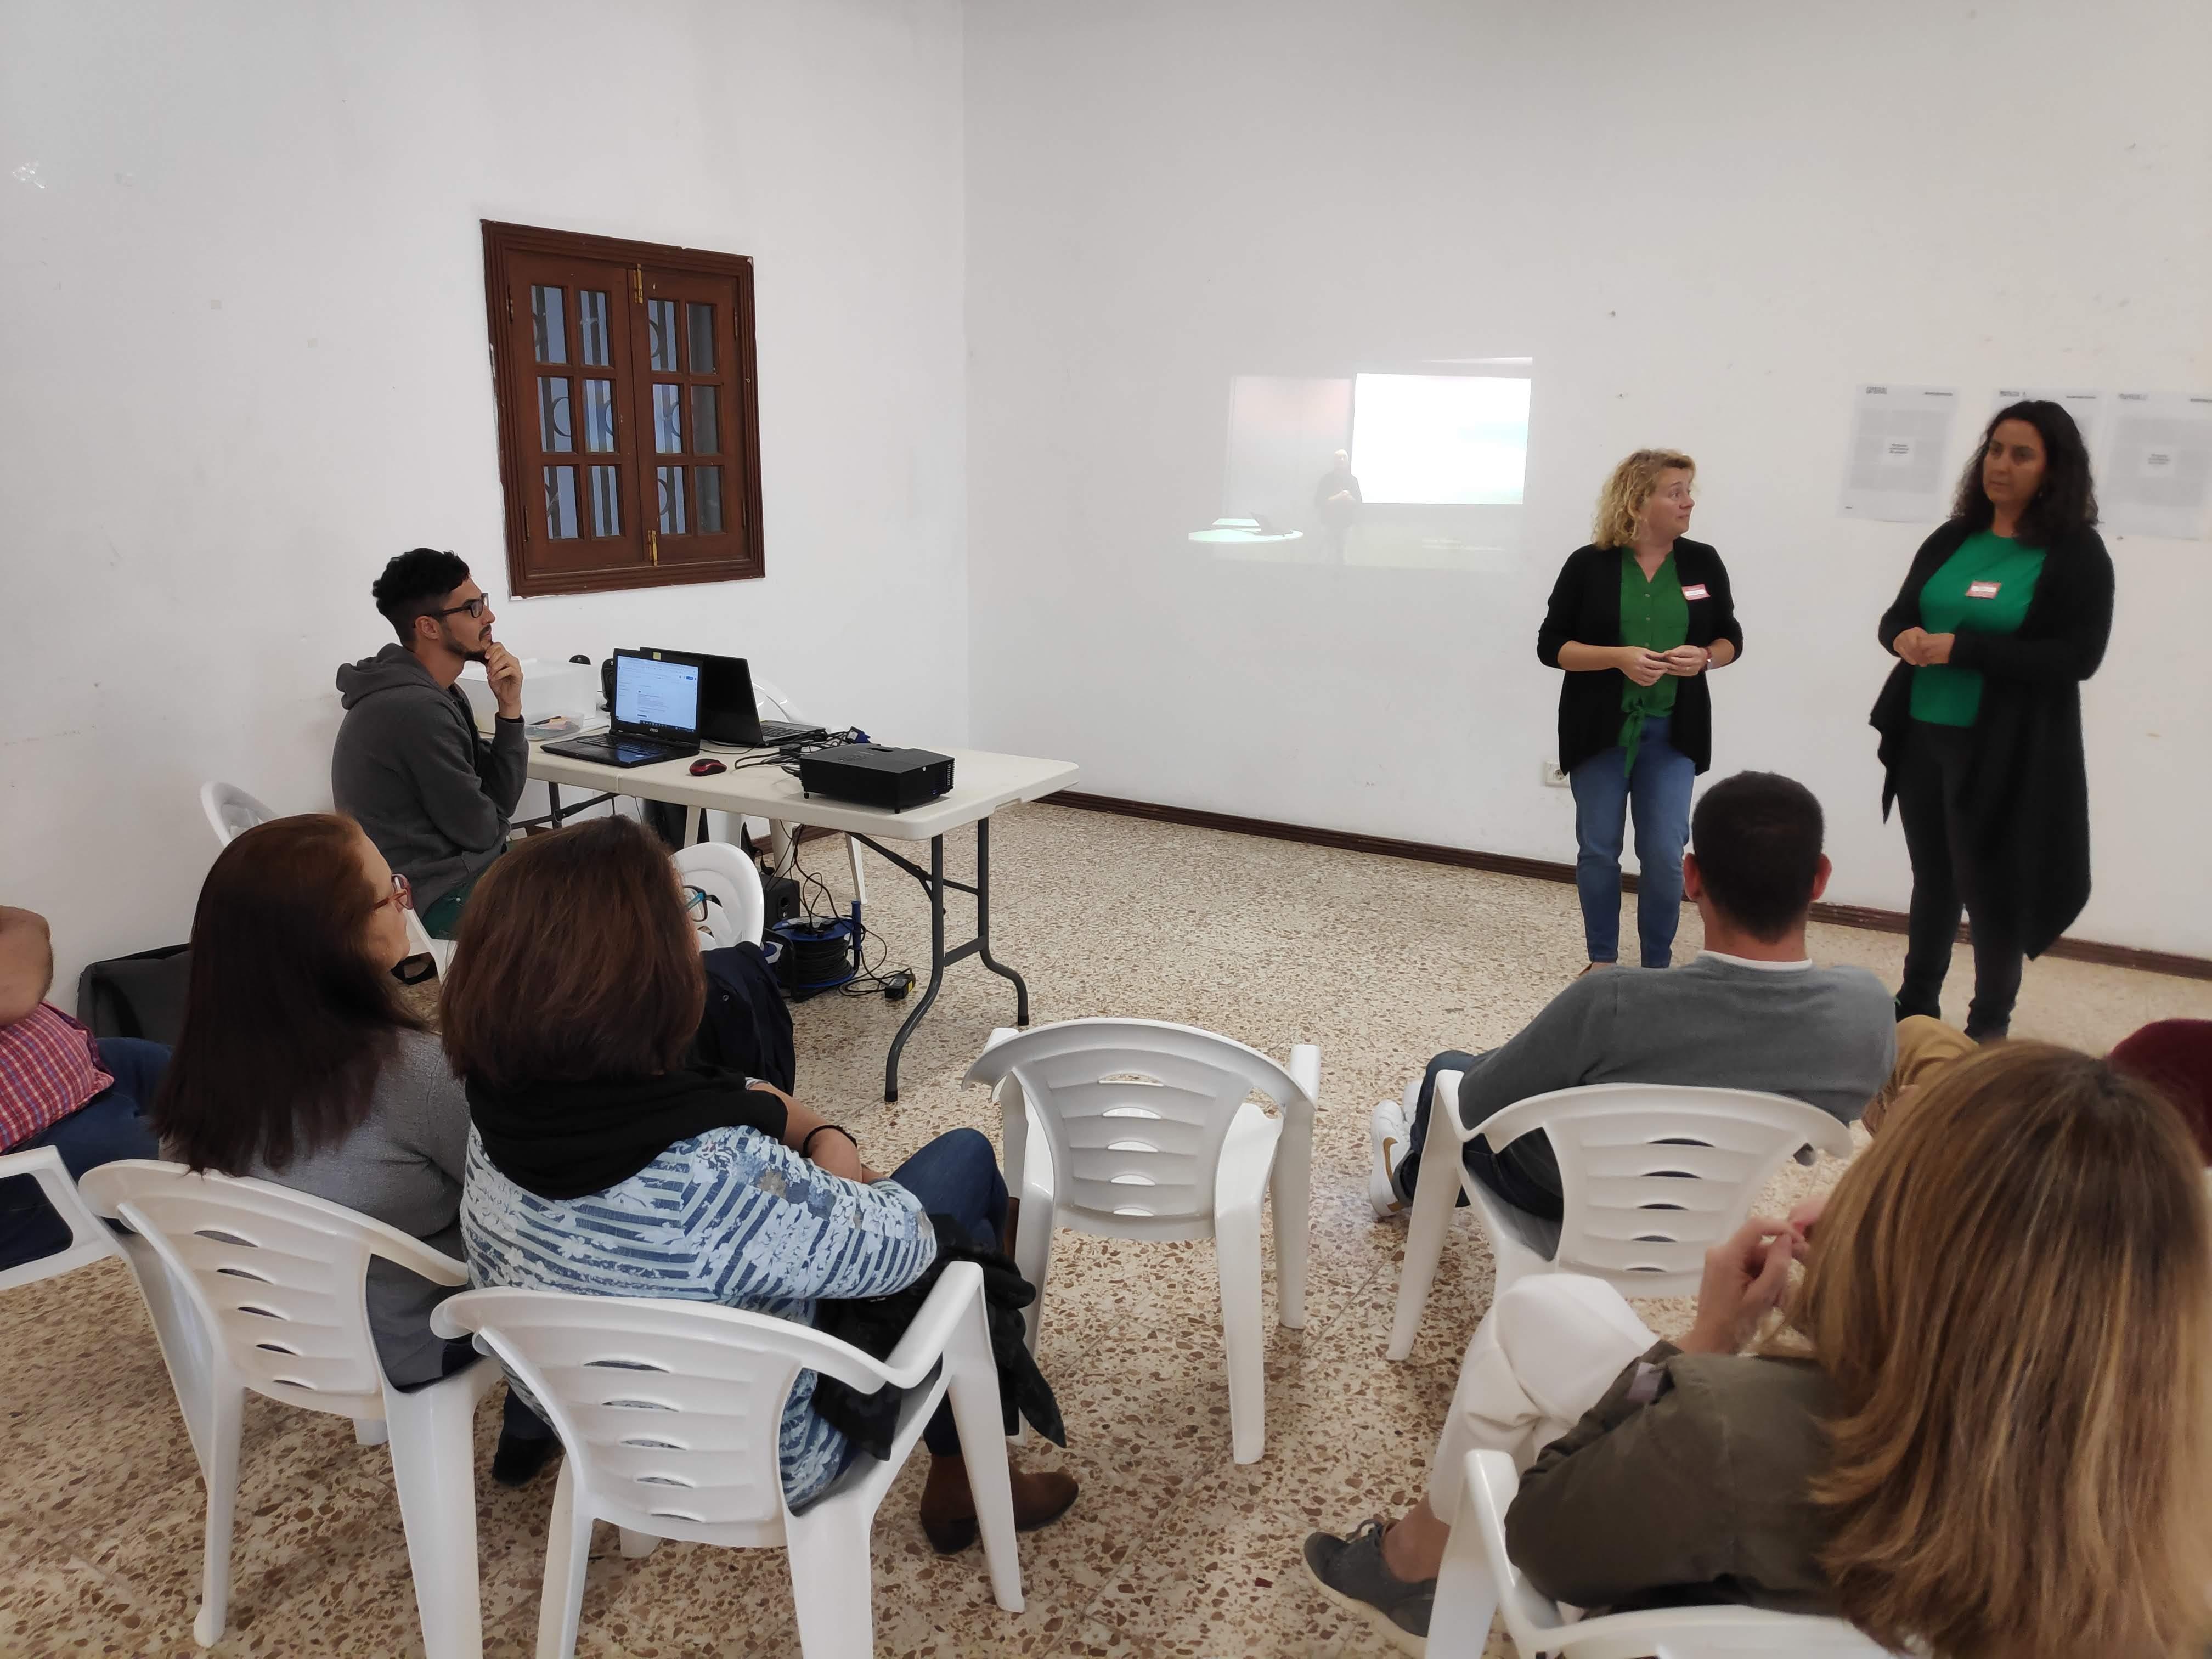 "<span class=""highlighted bluebg-whitefg"">Tecnología Cívica y Datos Ciudadanos</span><br>Jornada #02"